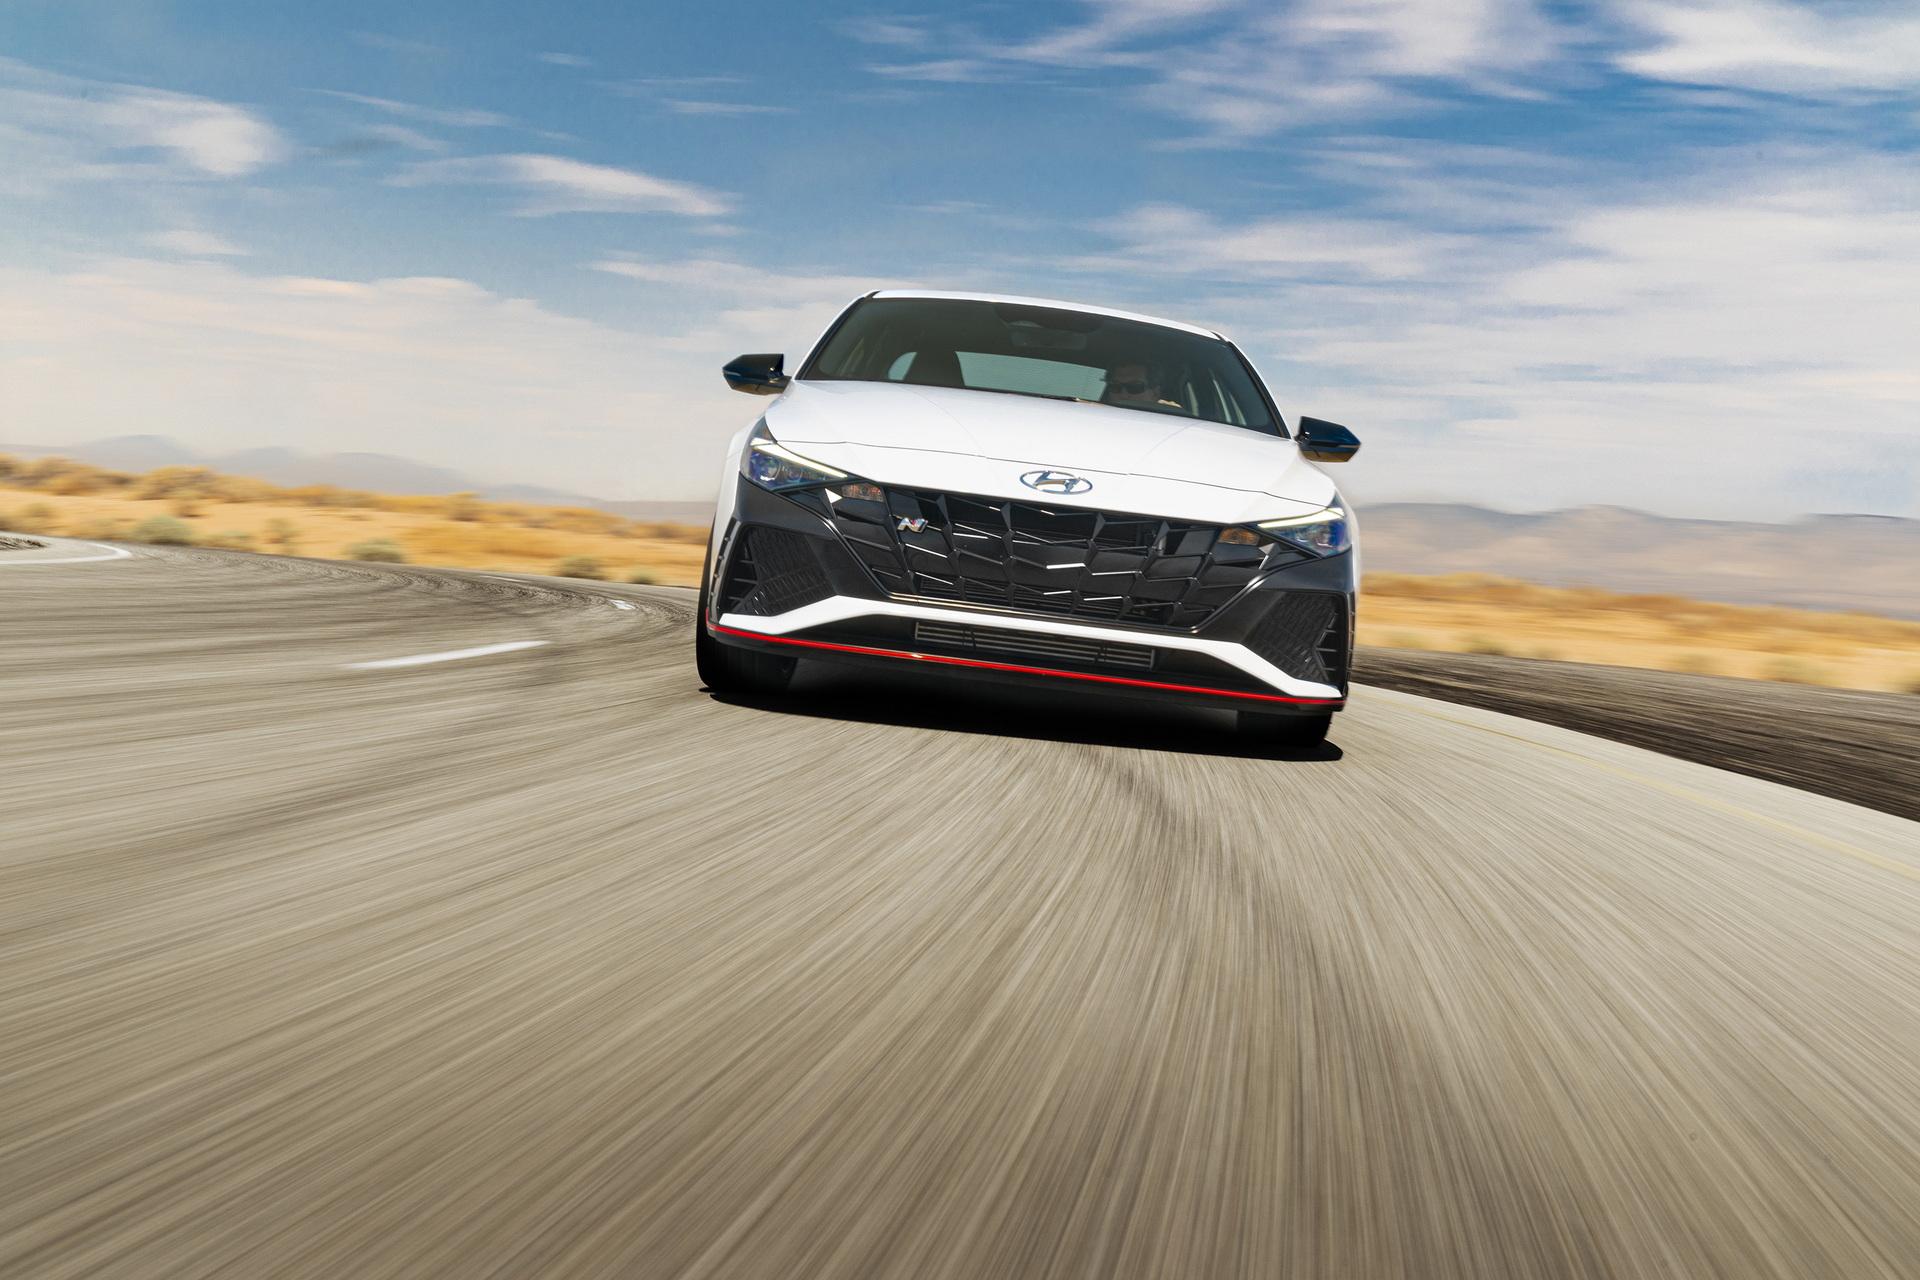 2022 Hyundai Elantra N Front Wallpapers (5)